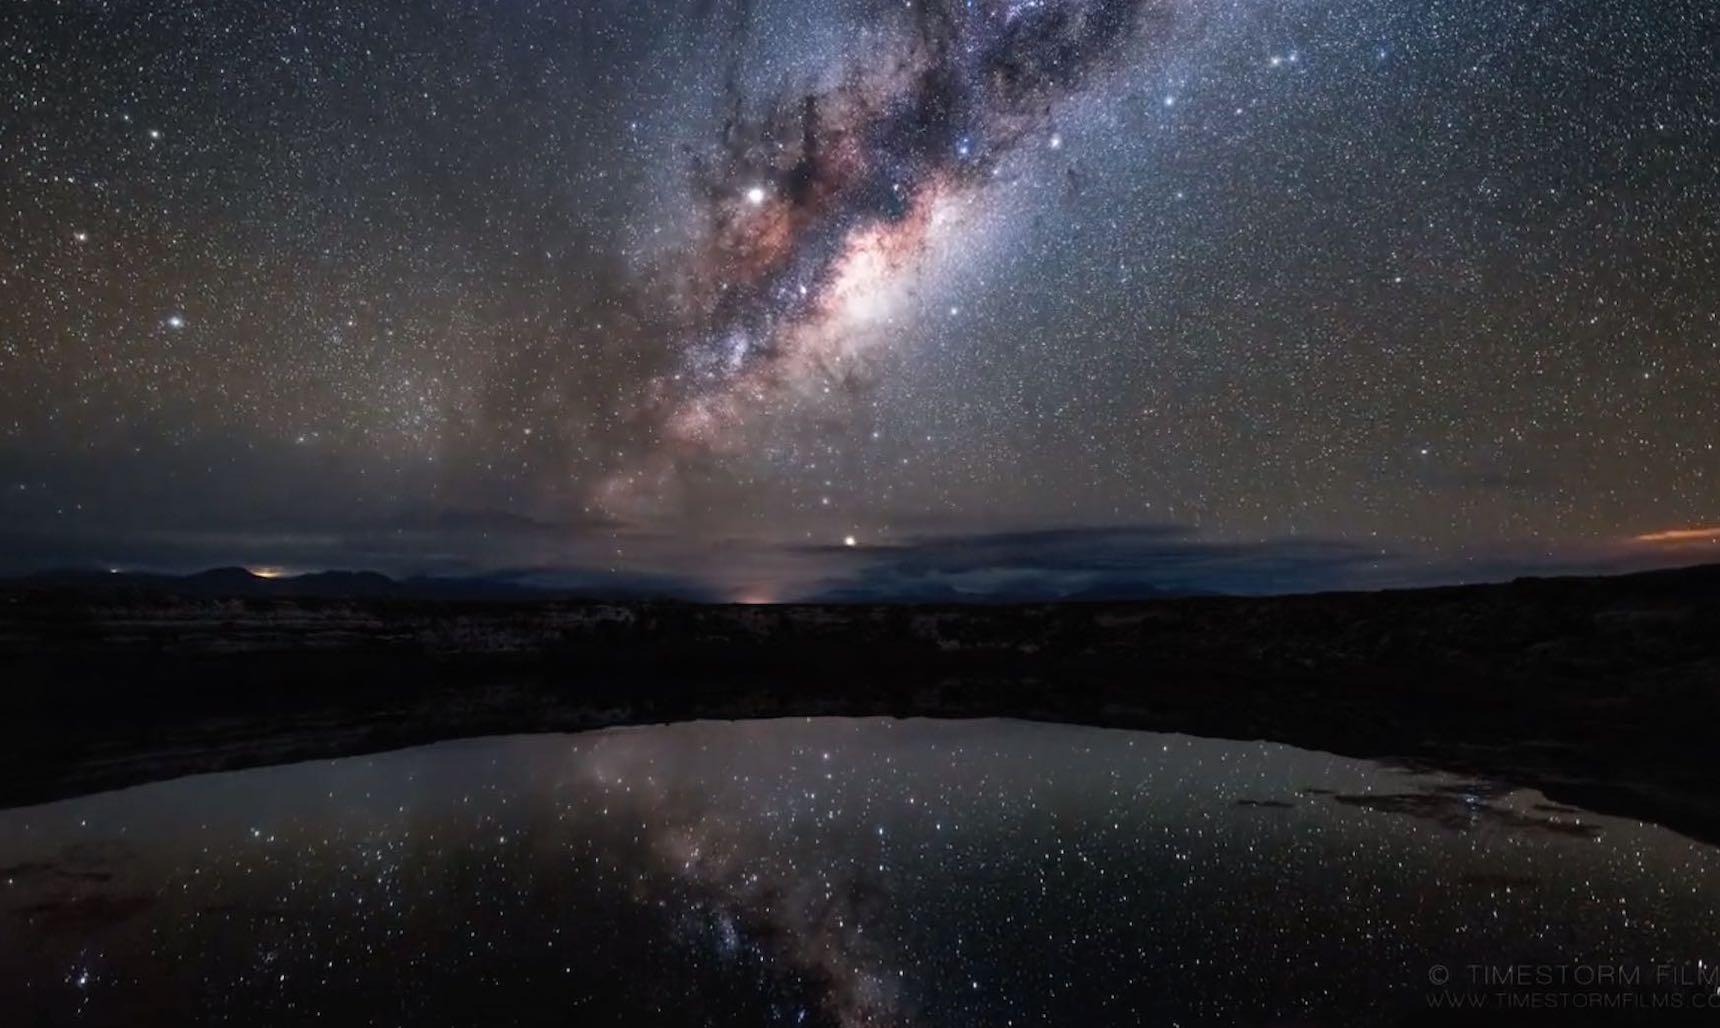 Starry sky above the Atacama desert